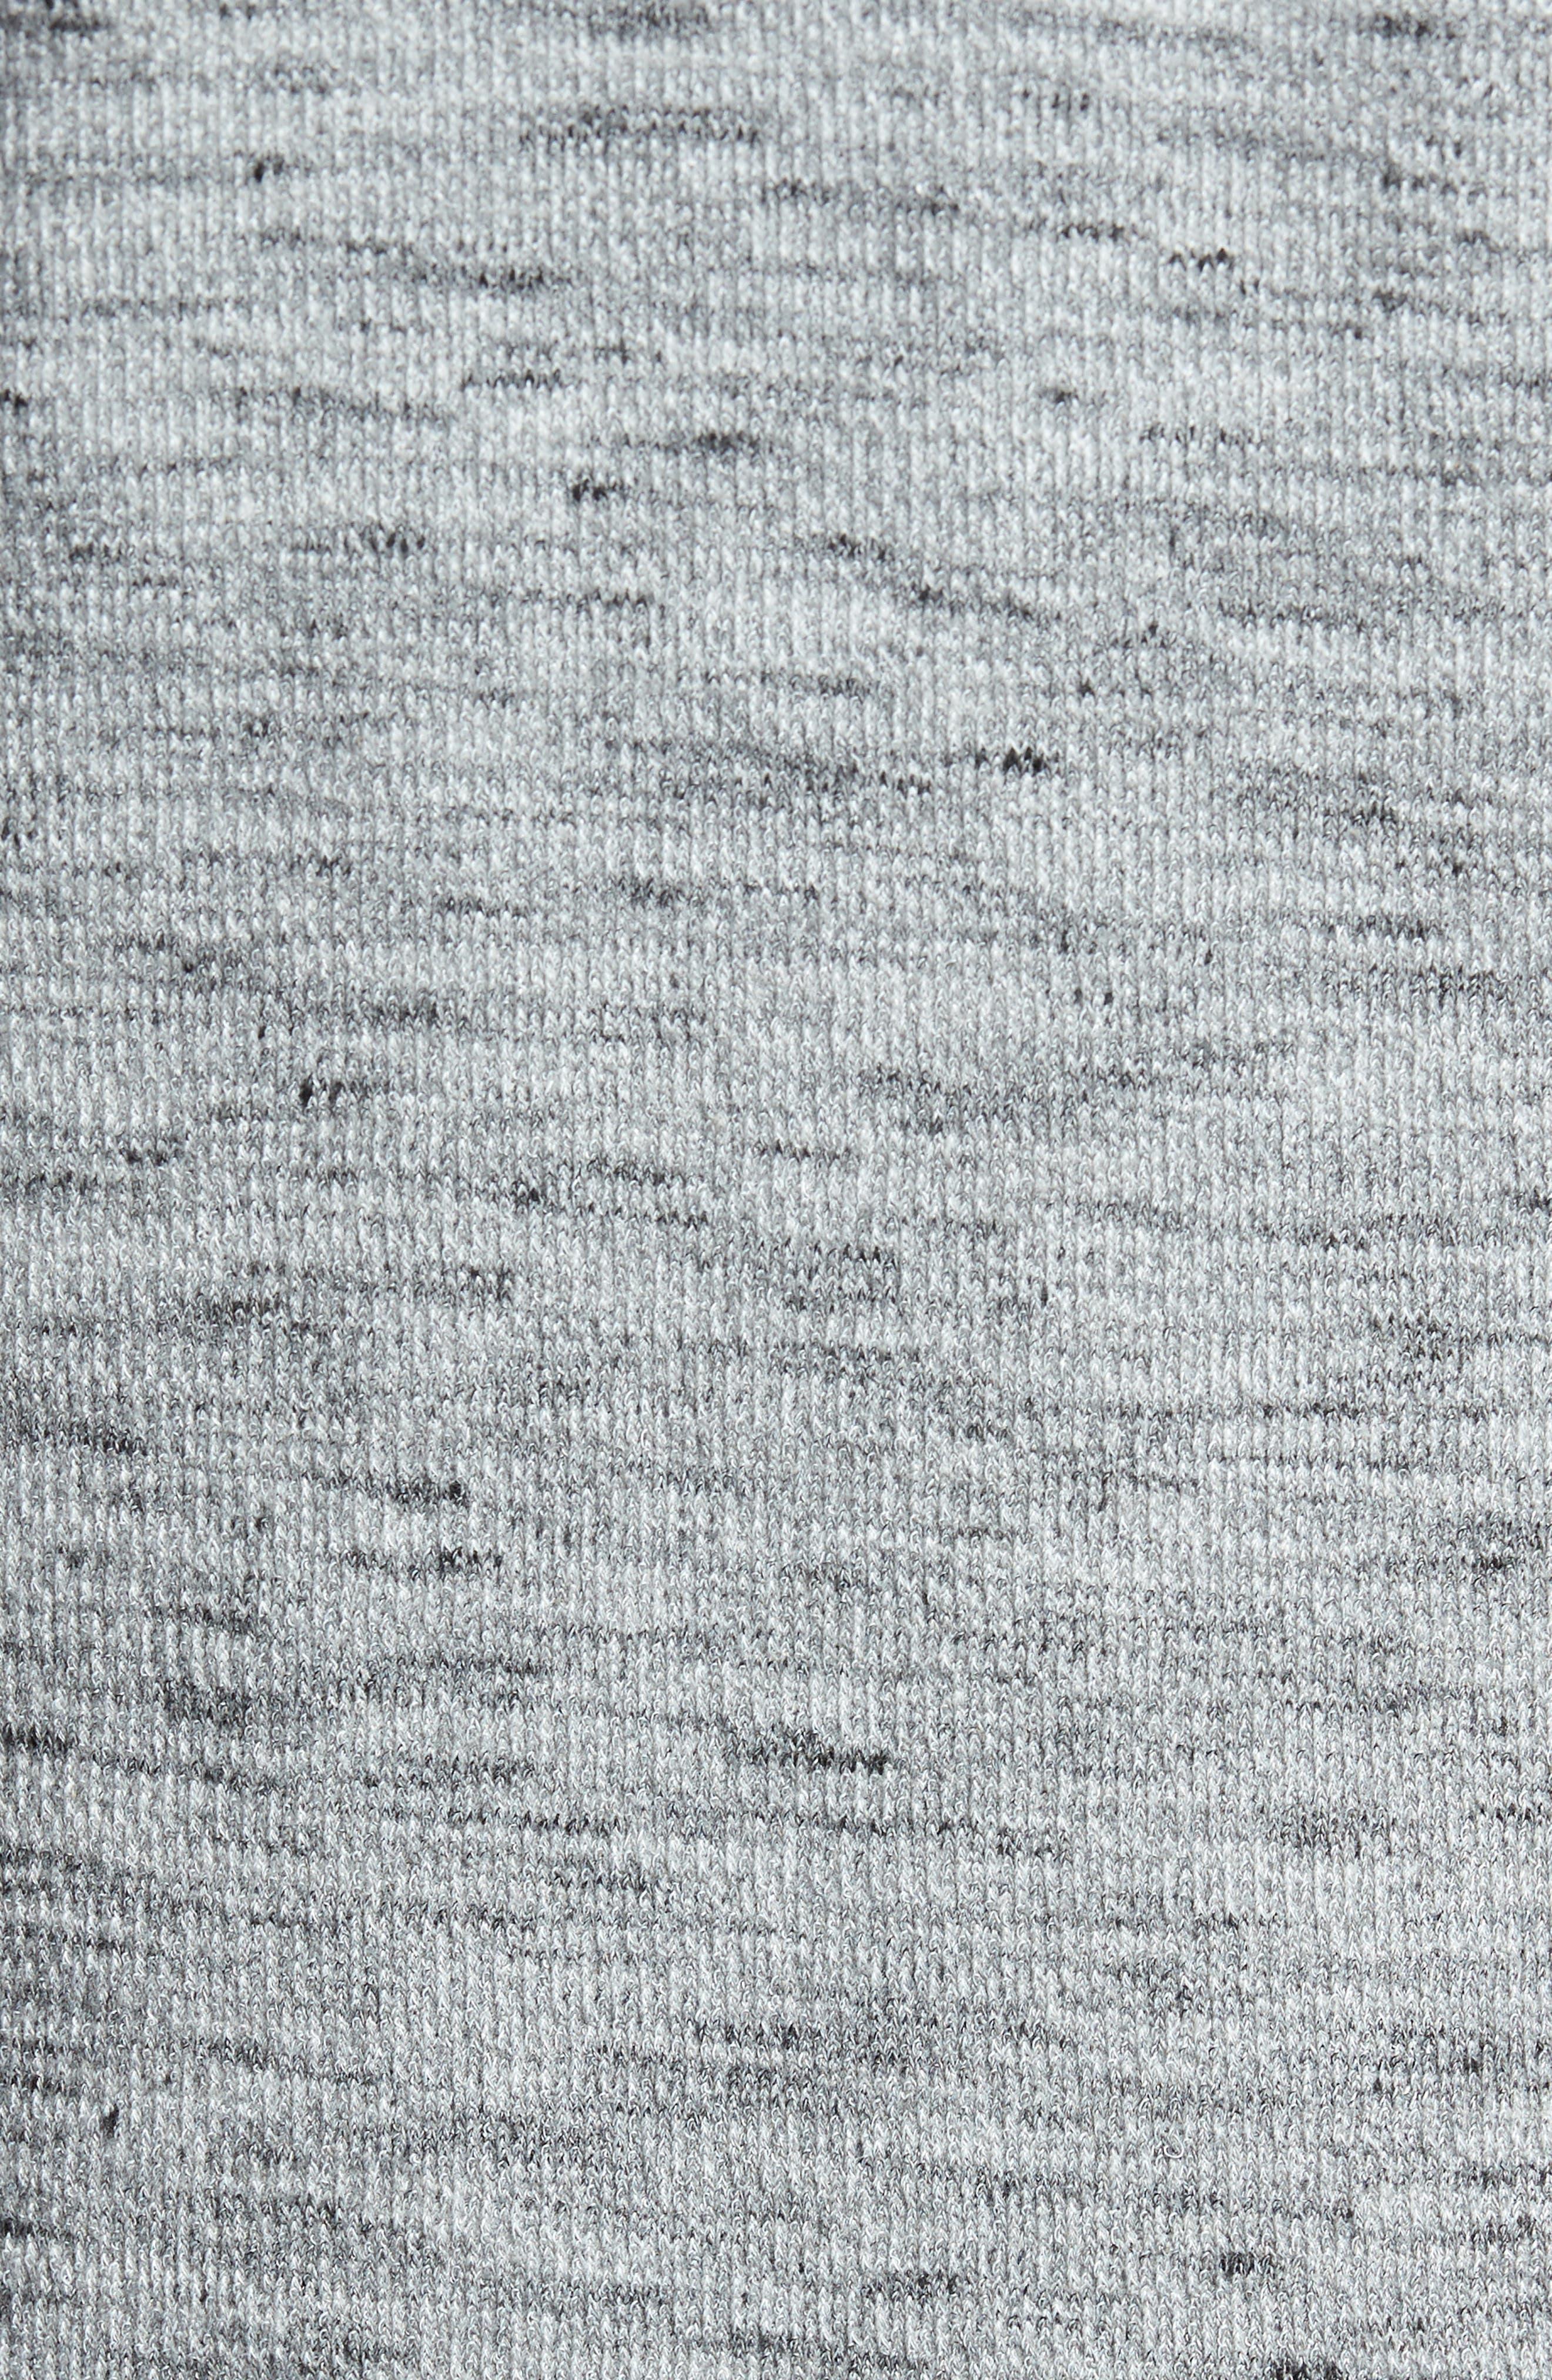 Waffle Knit Shirt,                             Alternate thumbnail 5, color,                             Grey Sleet Melange